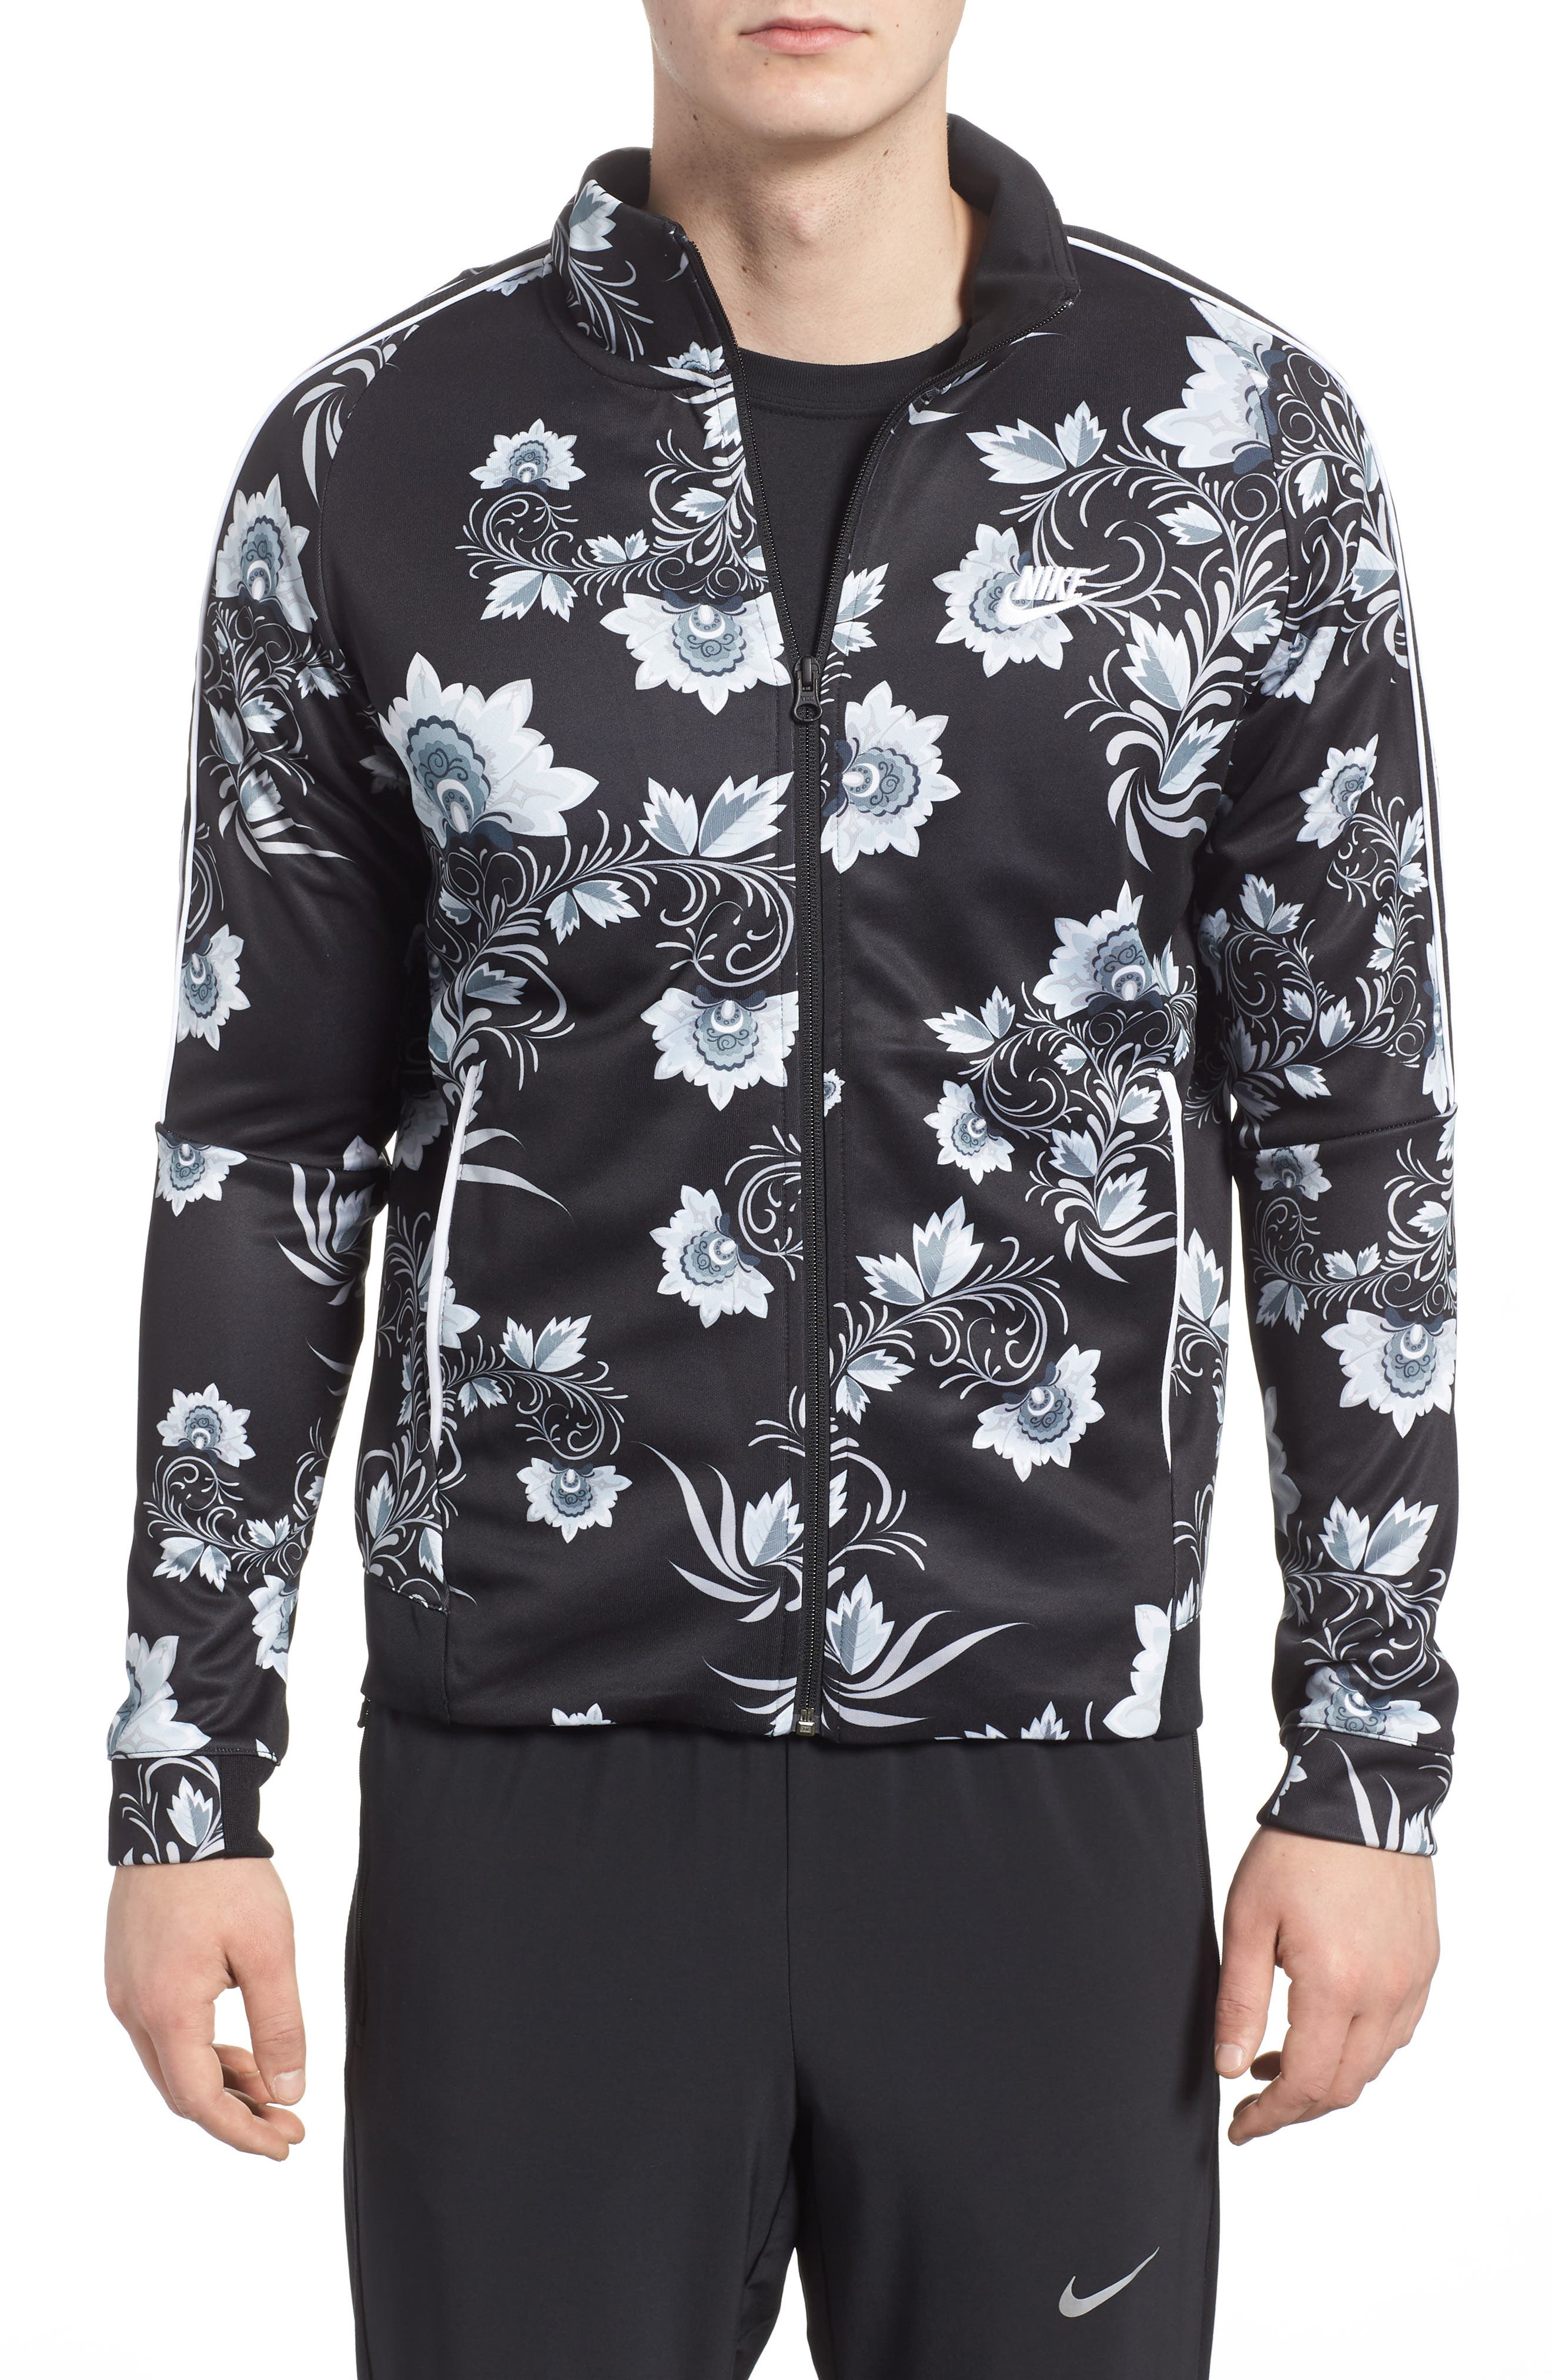 NSW Tribute Jacket,                             Main thumbnail 1, color,                             White/ Black/ White